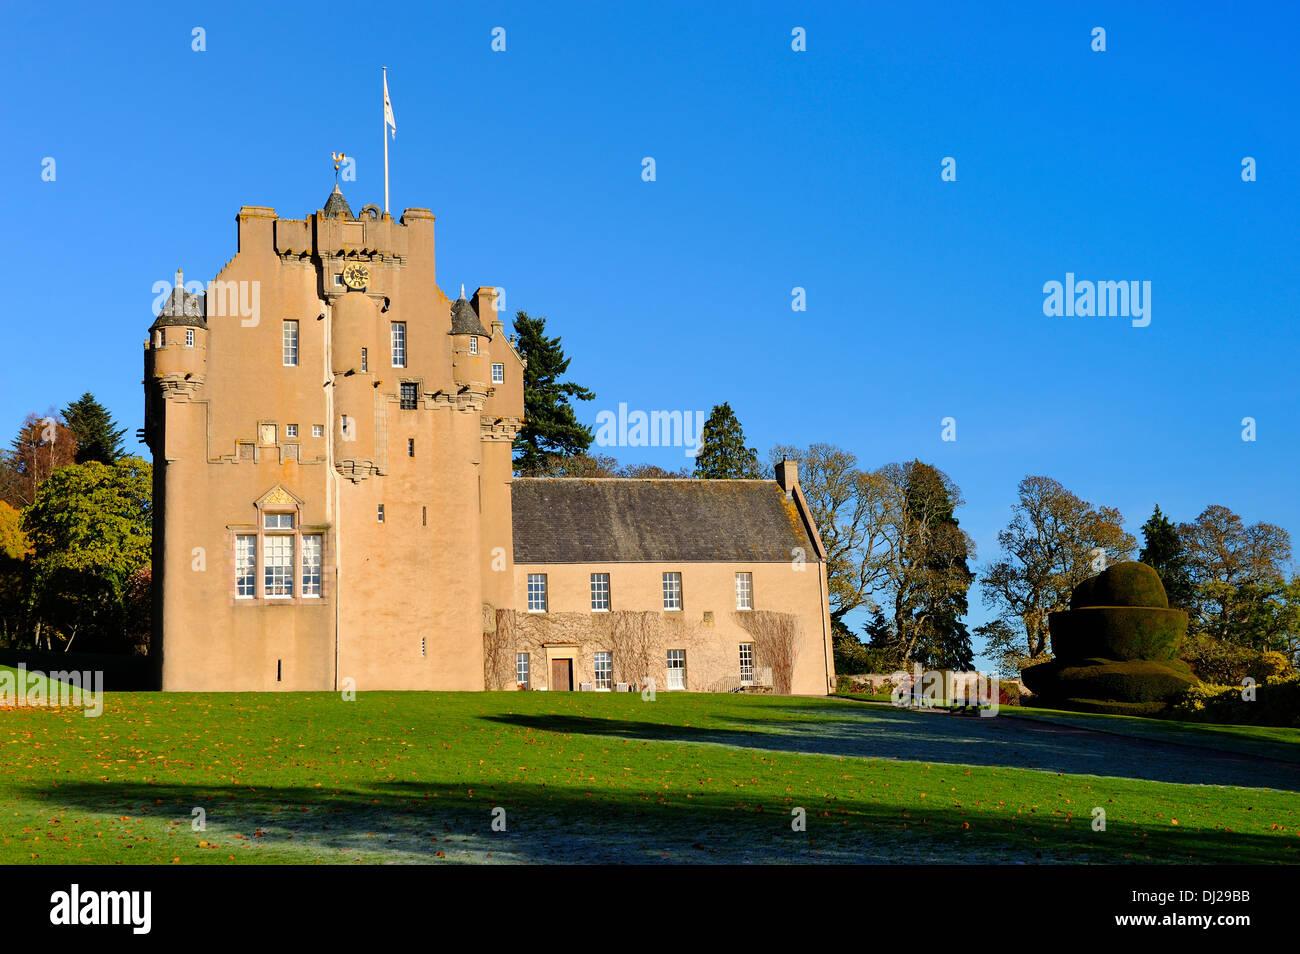 Crathes Castle near Banchory, Aberdeenshire, Scotland - Stock Image